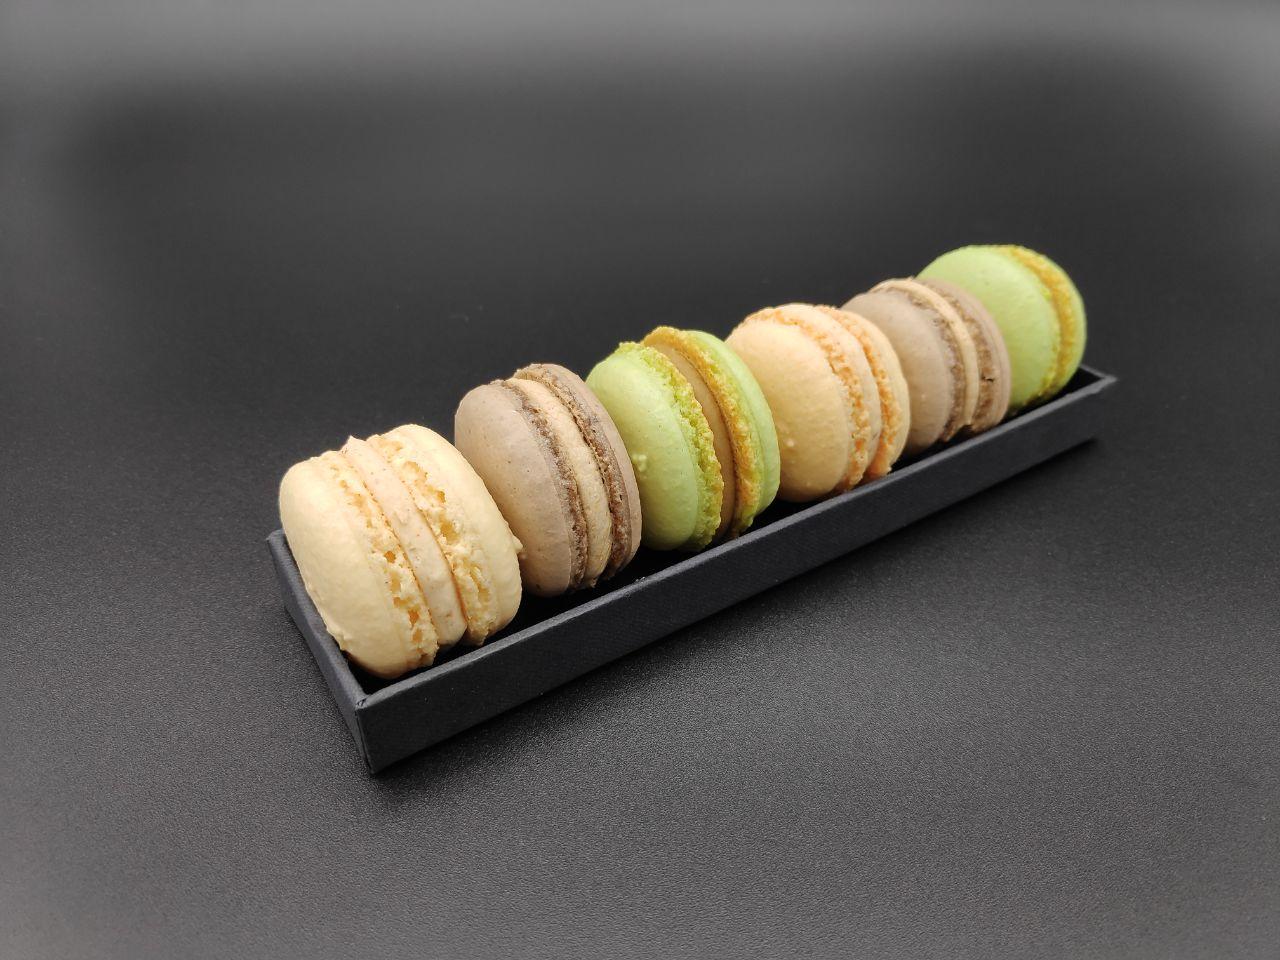 Macarons nussig